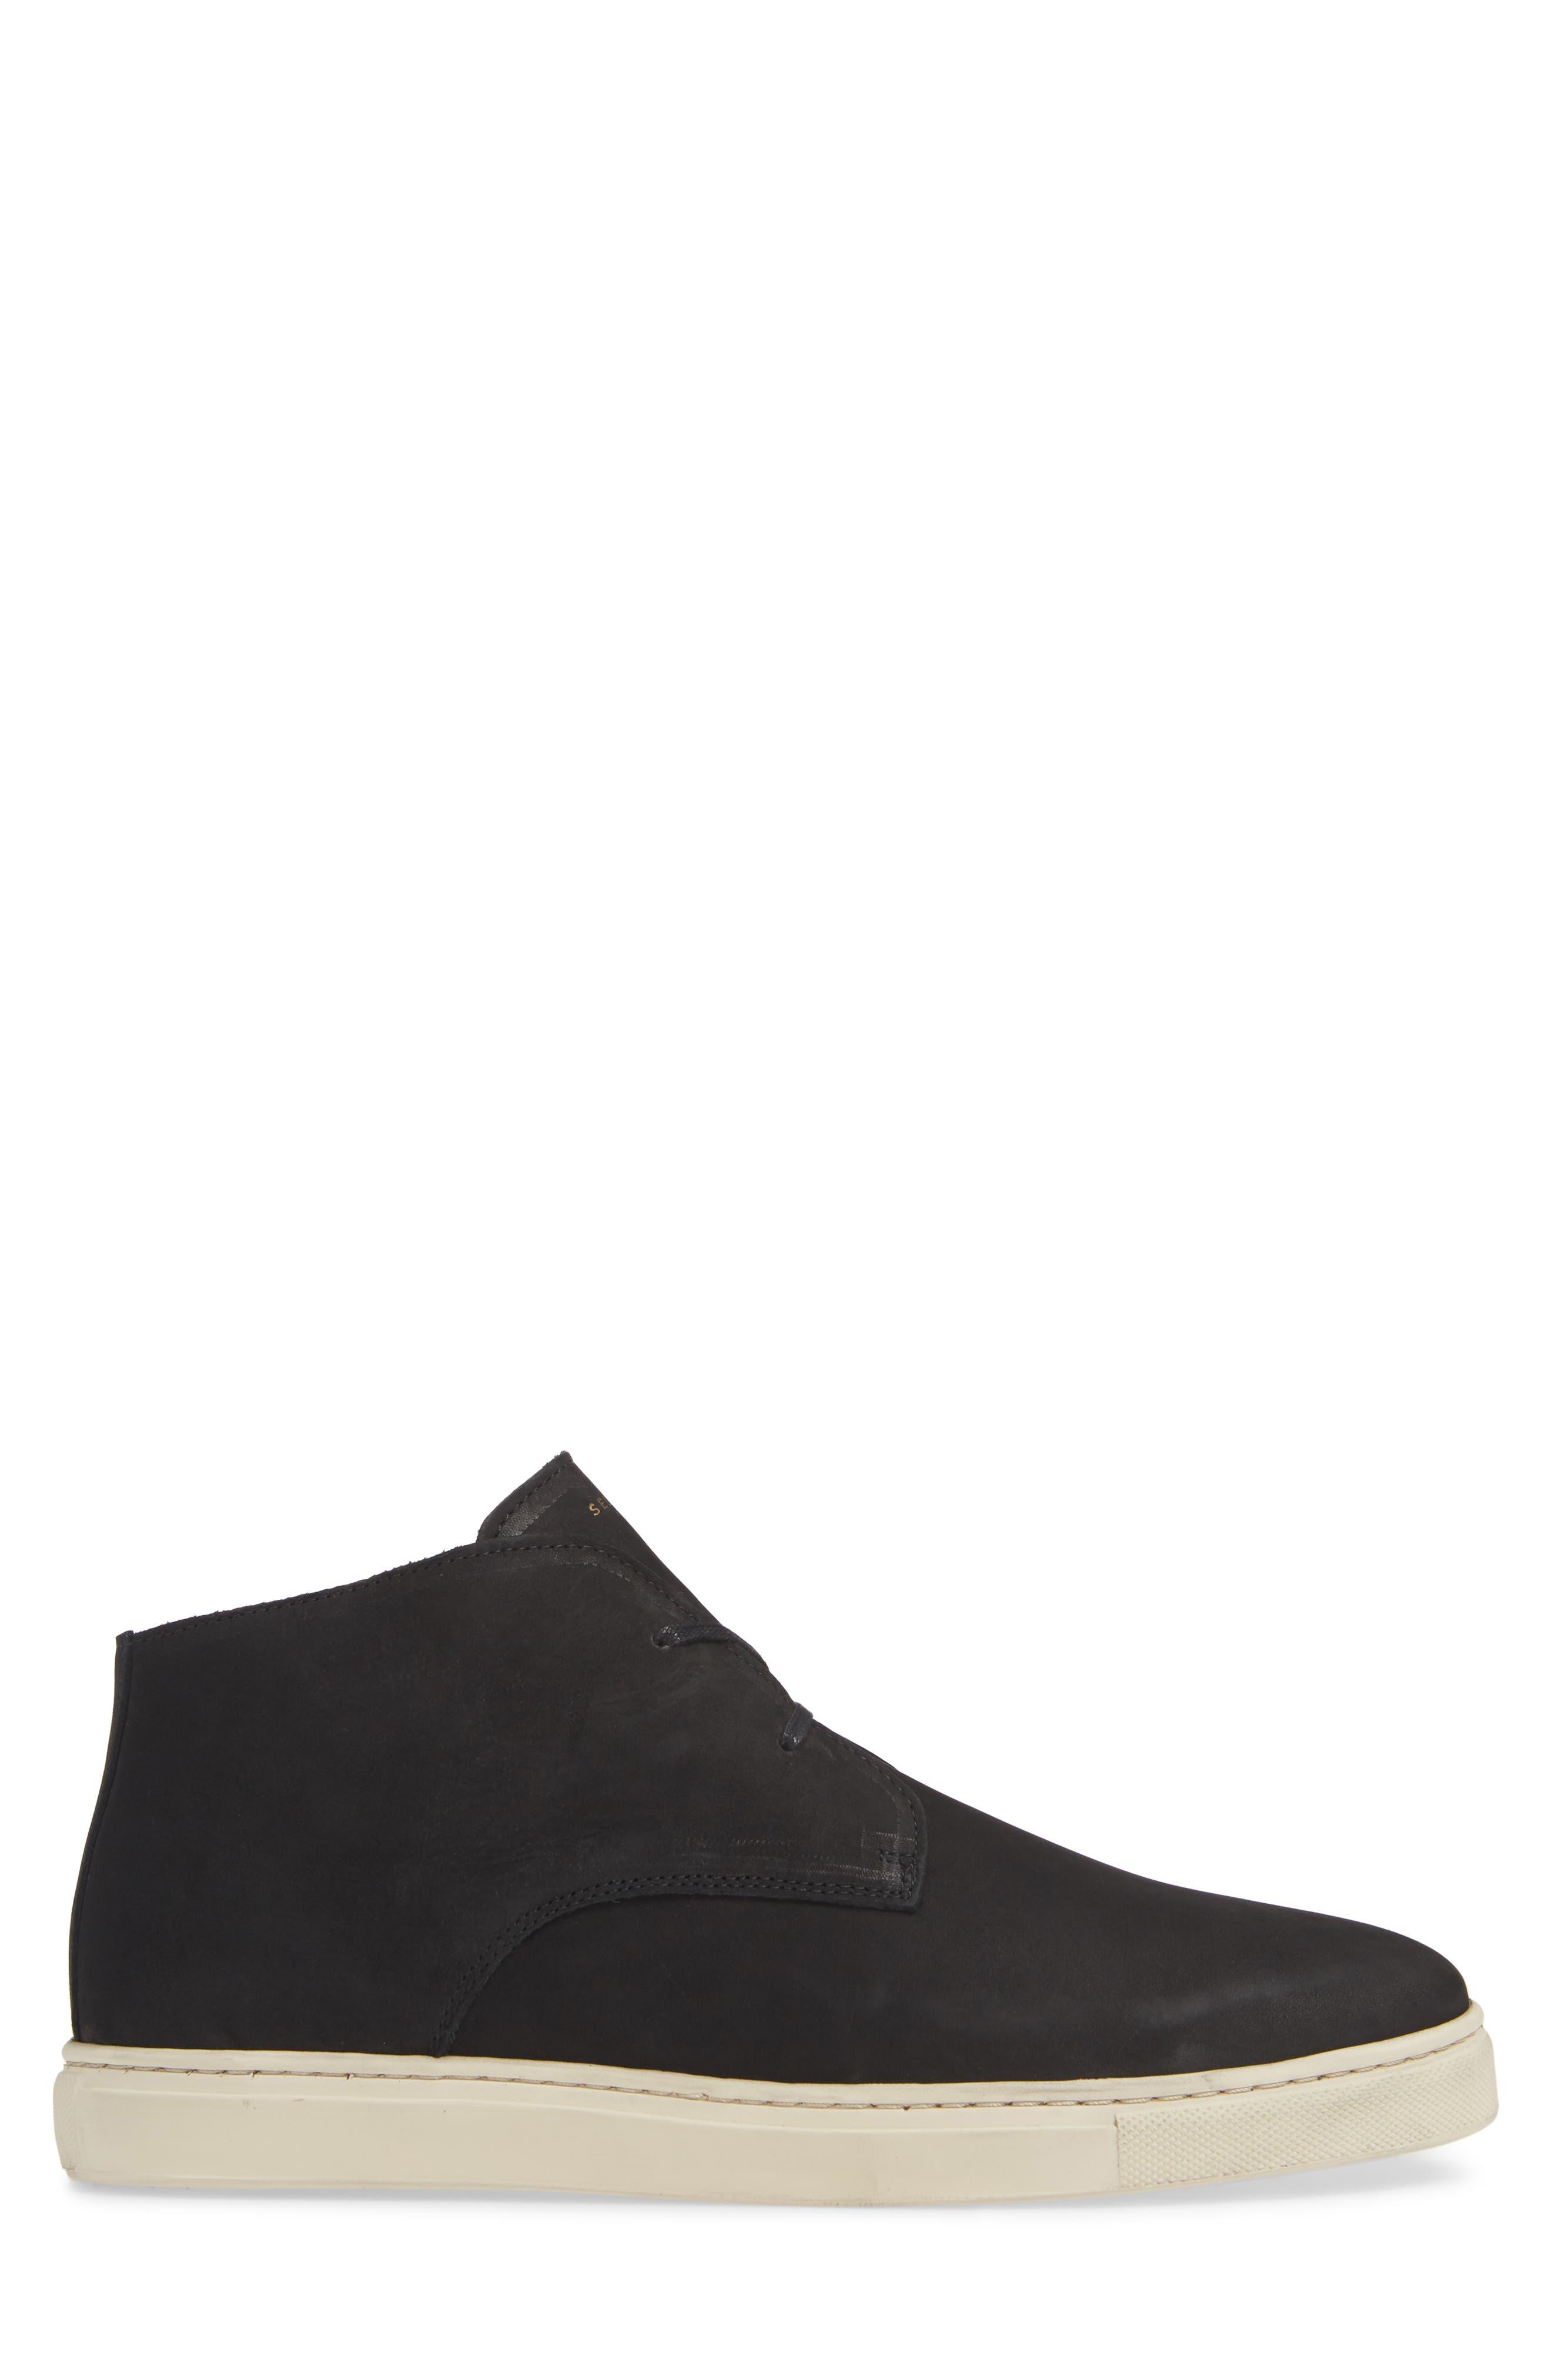 Dempsey Chukka Sneaker,                             Alternate thumbnail 3, color,                             BLACK